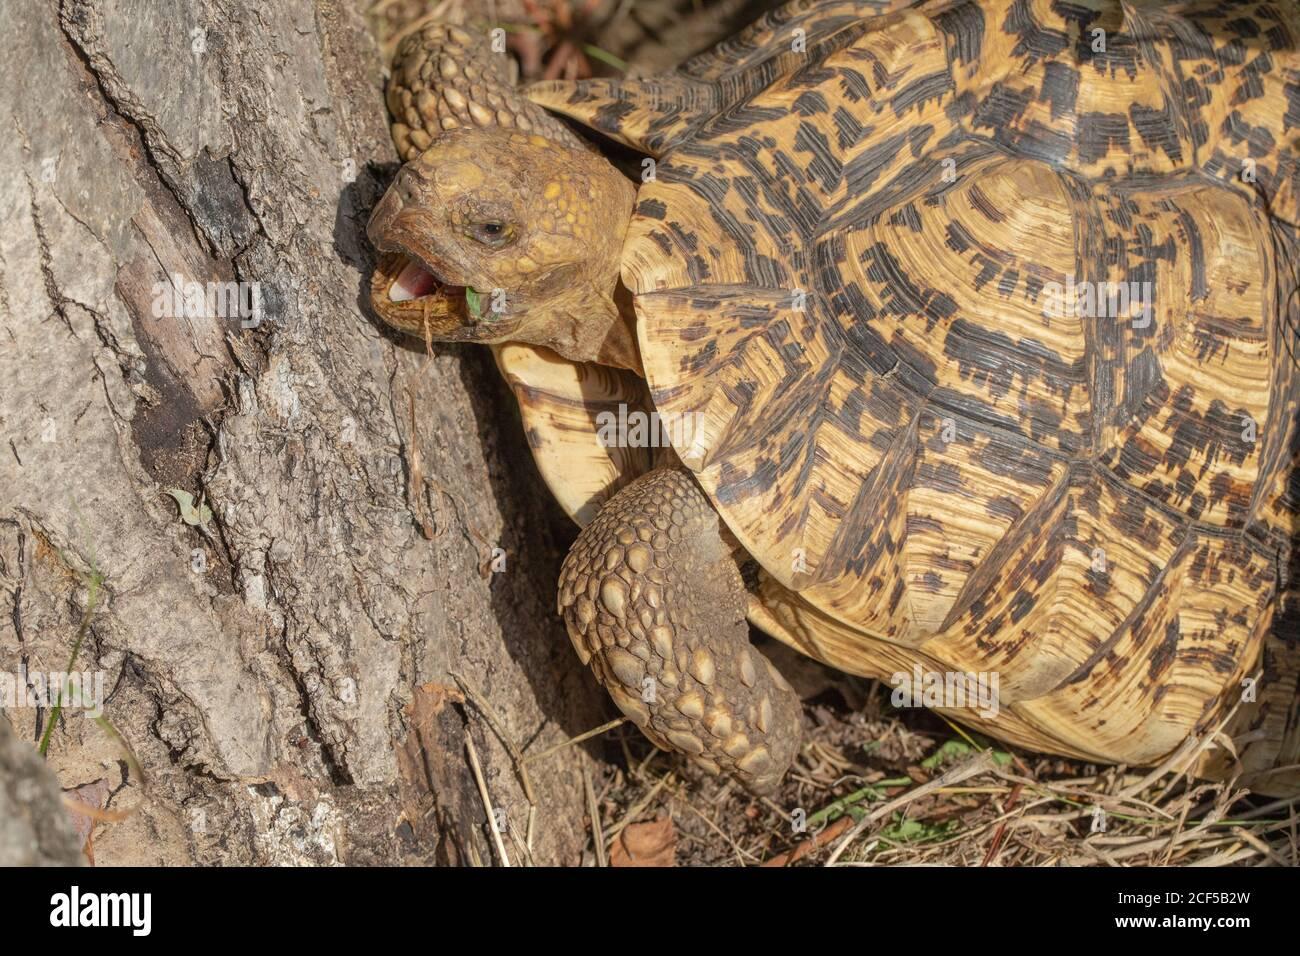 Leopard Tortoise (Stigmochelys pardalis). Morning temperature rise induces ectothermic reptile into awakening for activites including seeking, foragin Stock Photo